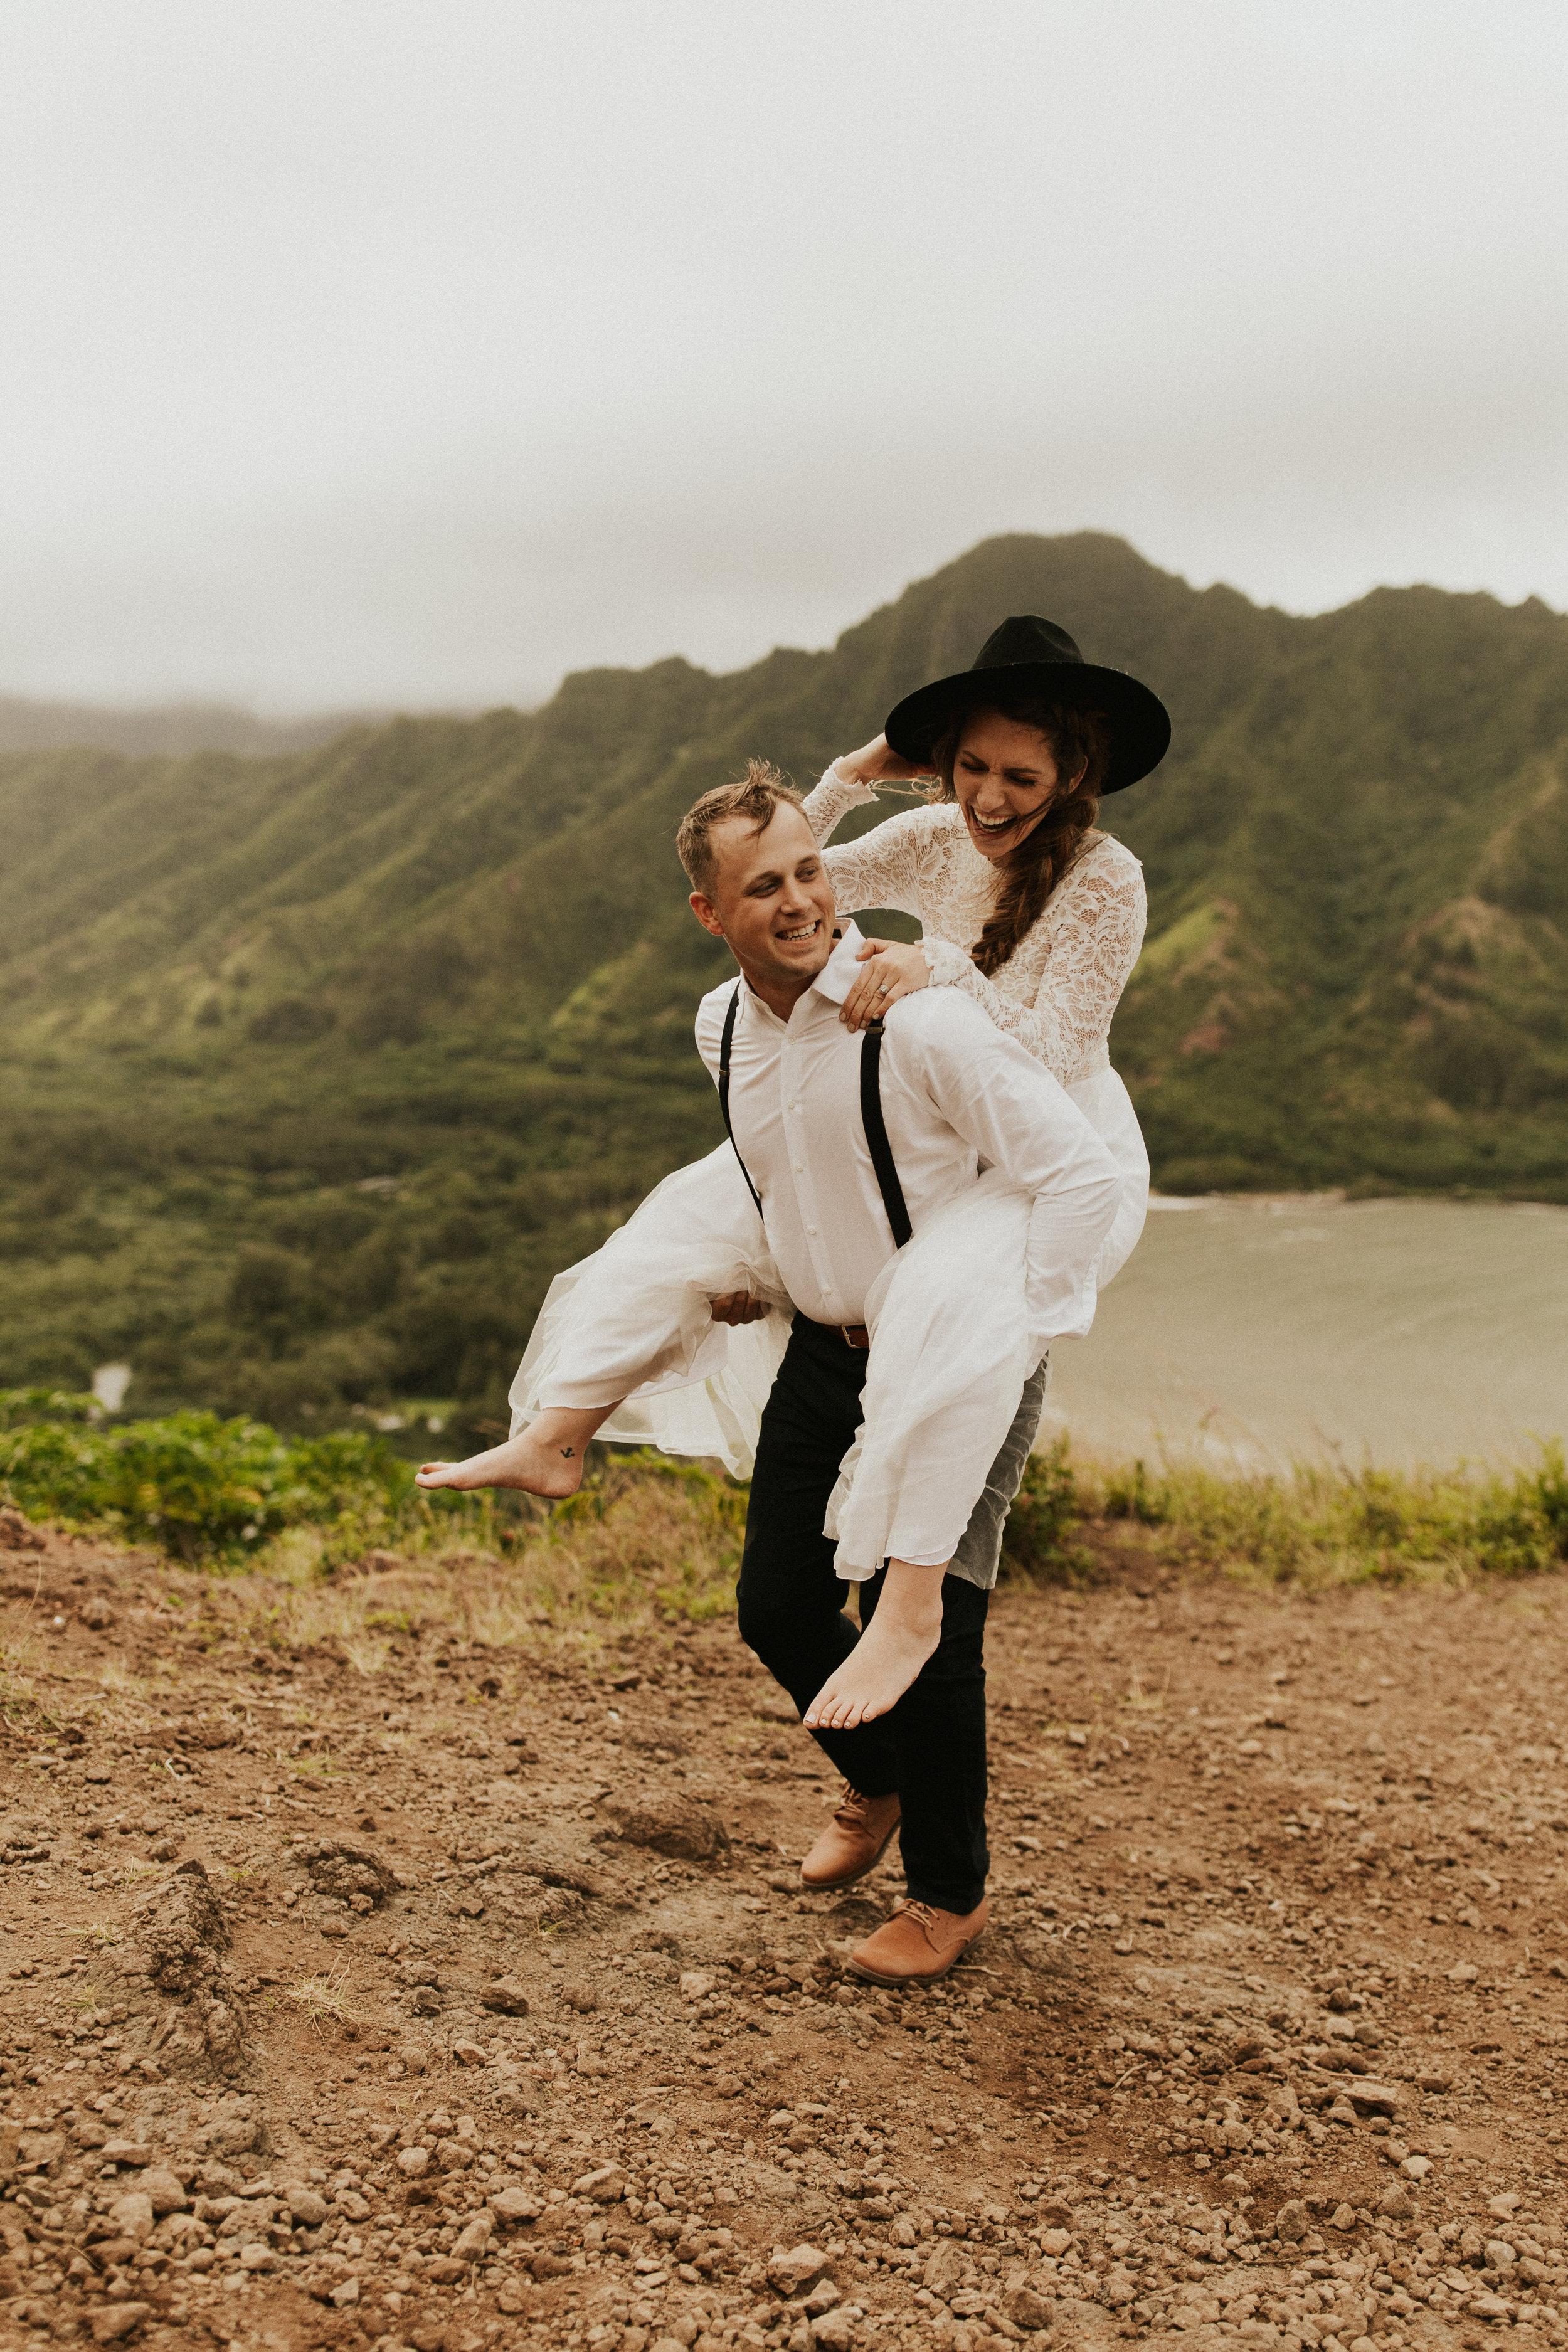 the-mclachlans-destination-elopement-photographers-mountain-hike-sena-eric-85.jpg